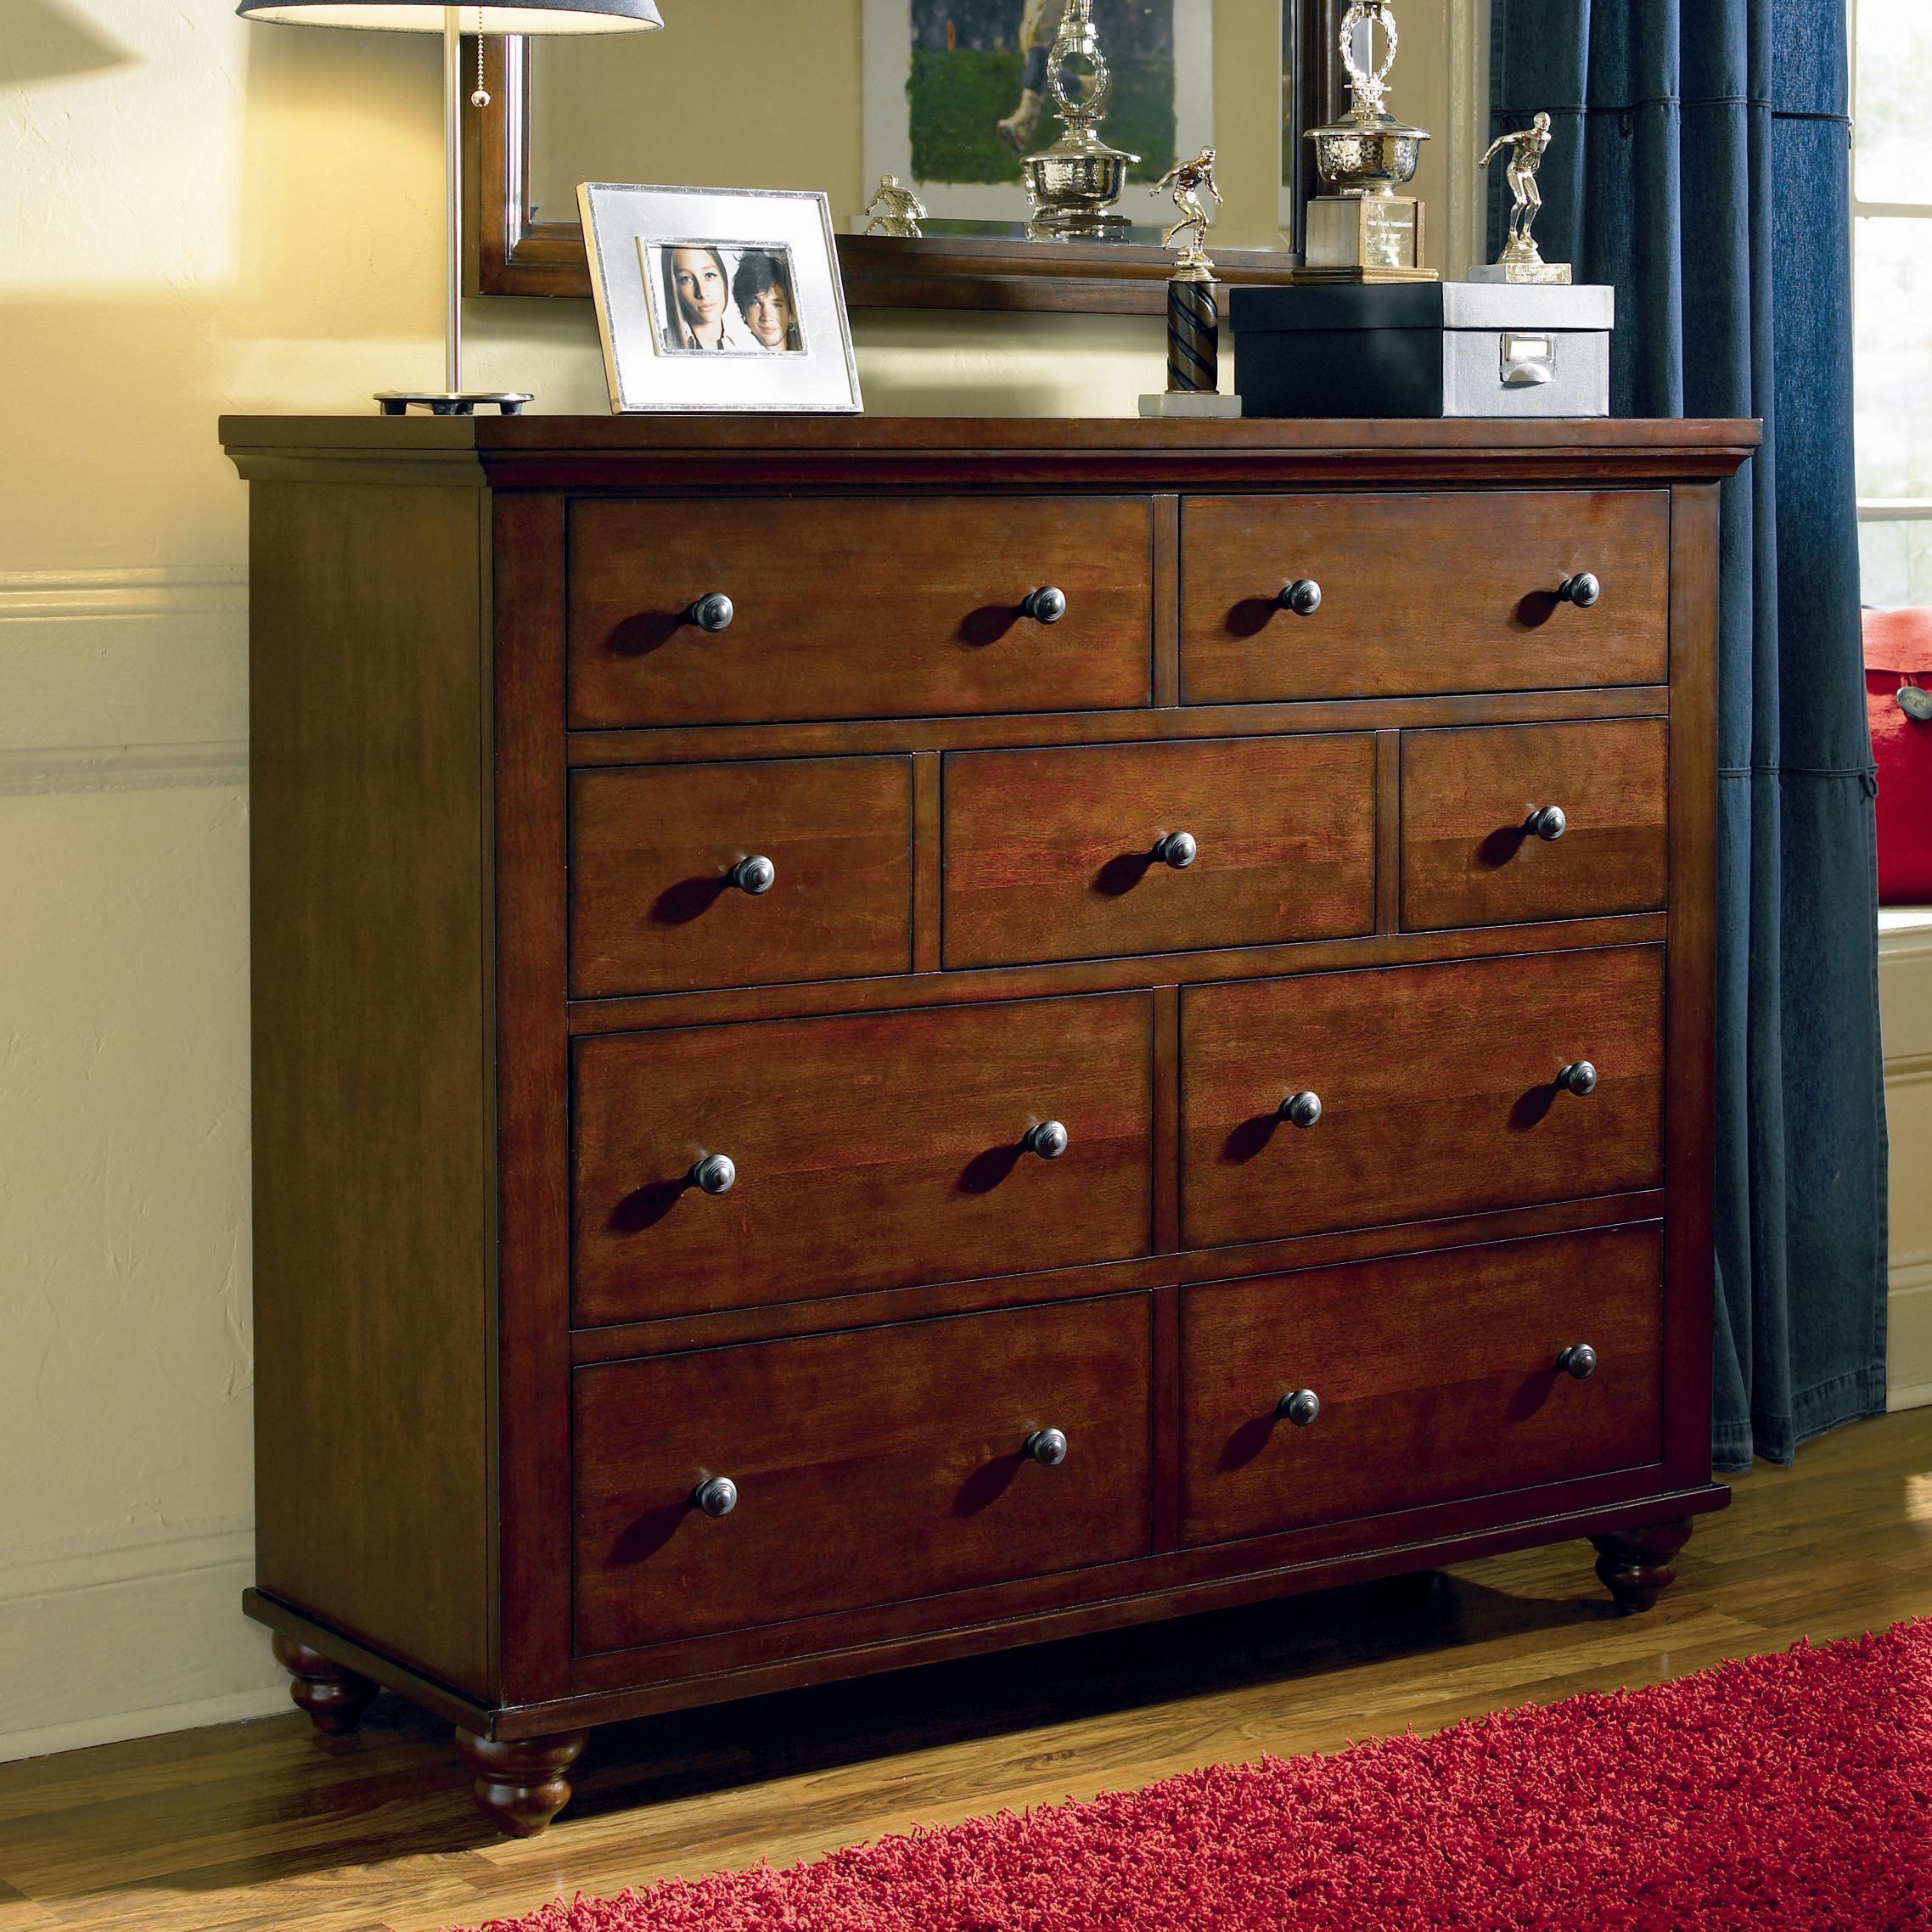 Aspenhome Cambridge Chesser With 9 Drawers   Hudsonu0027s Furniture   Dresser